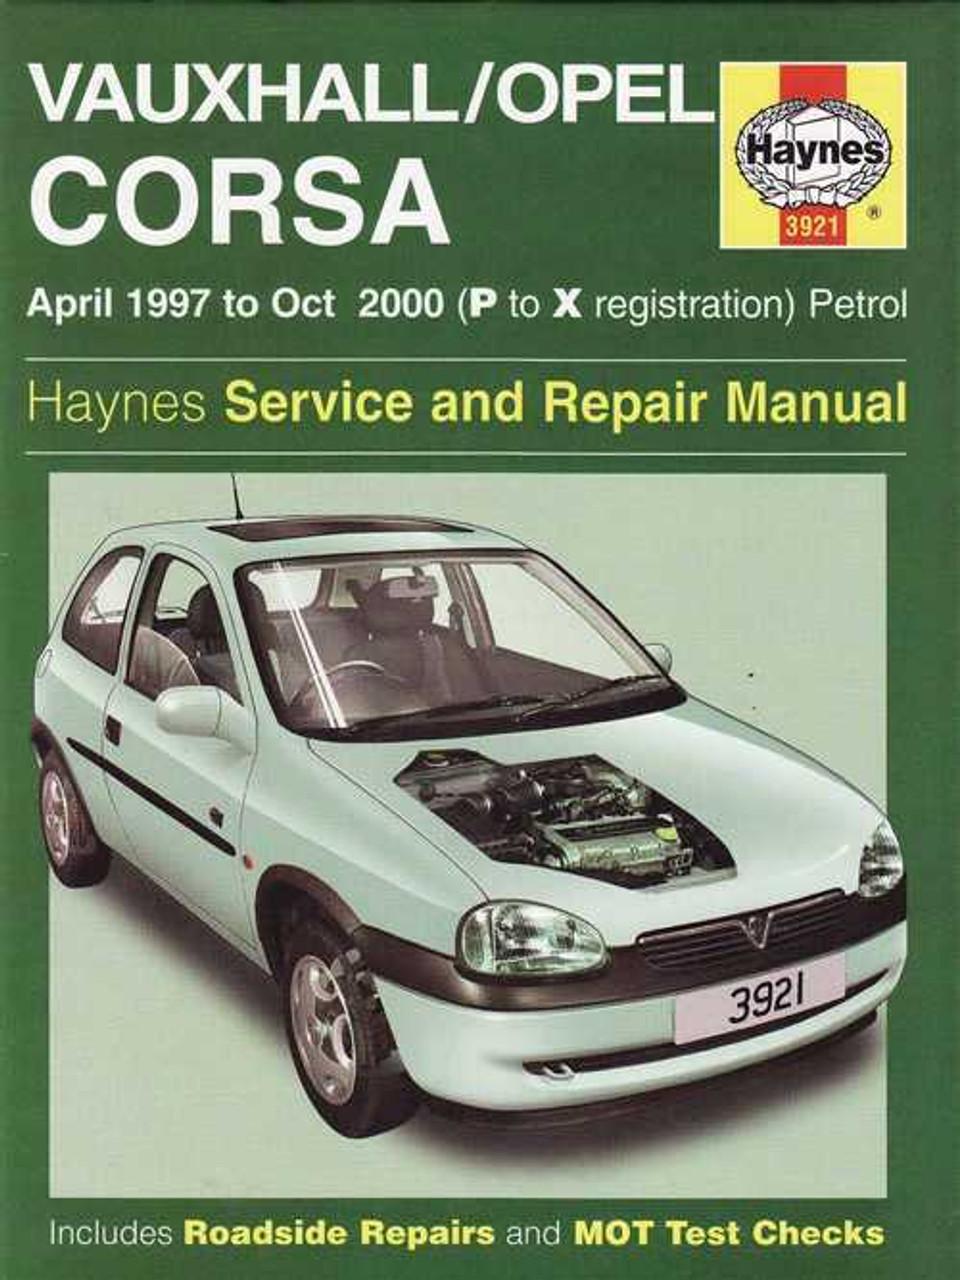 vauxhall astra full service repair manual 1998 2000